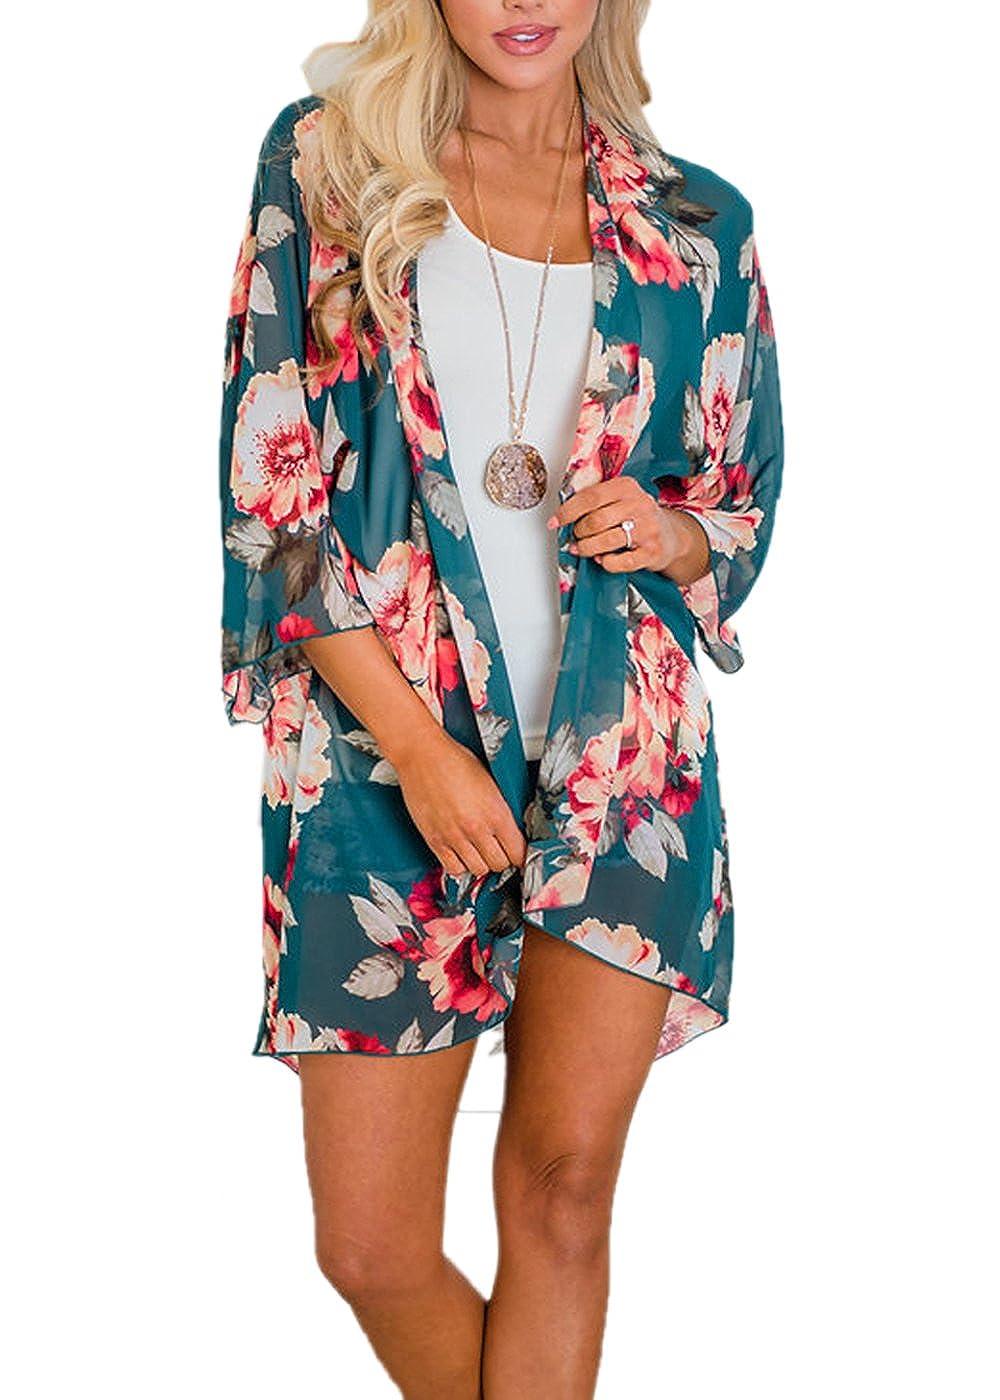 Runant Damen Sommer Boho Chiffon Kimono Stil Gedruckt Tops Jacke Cardigan Blusen Beachwear